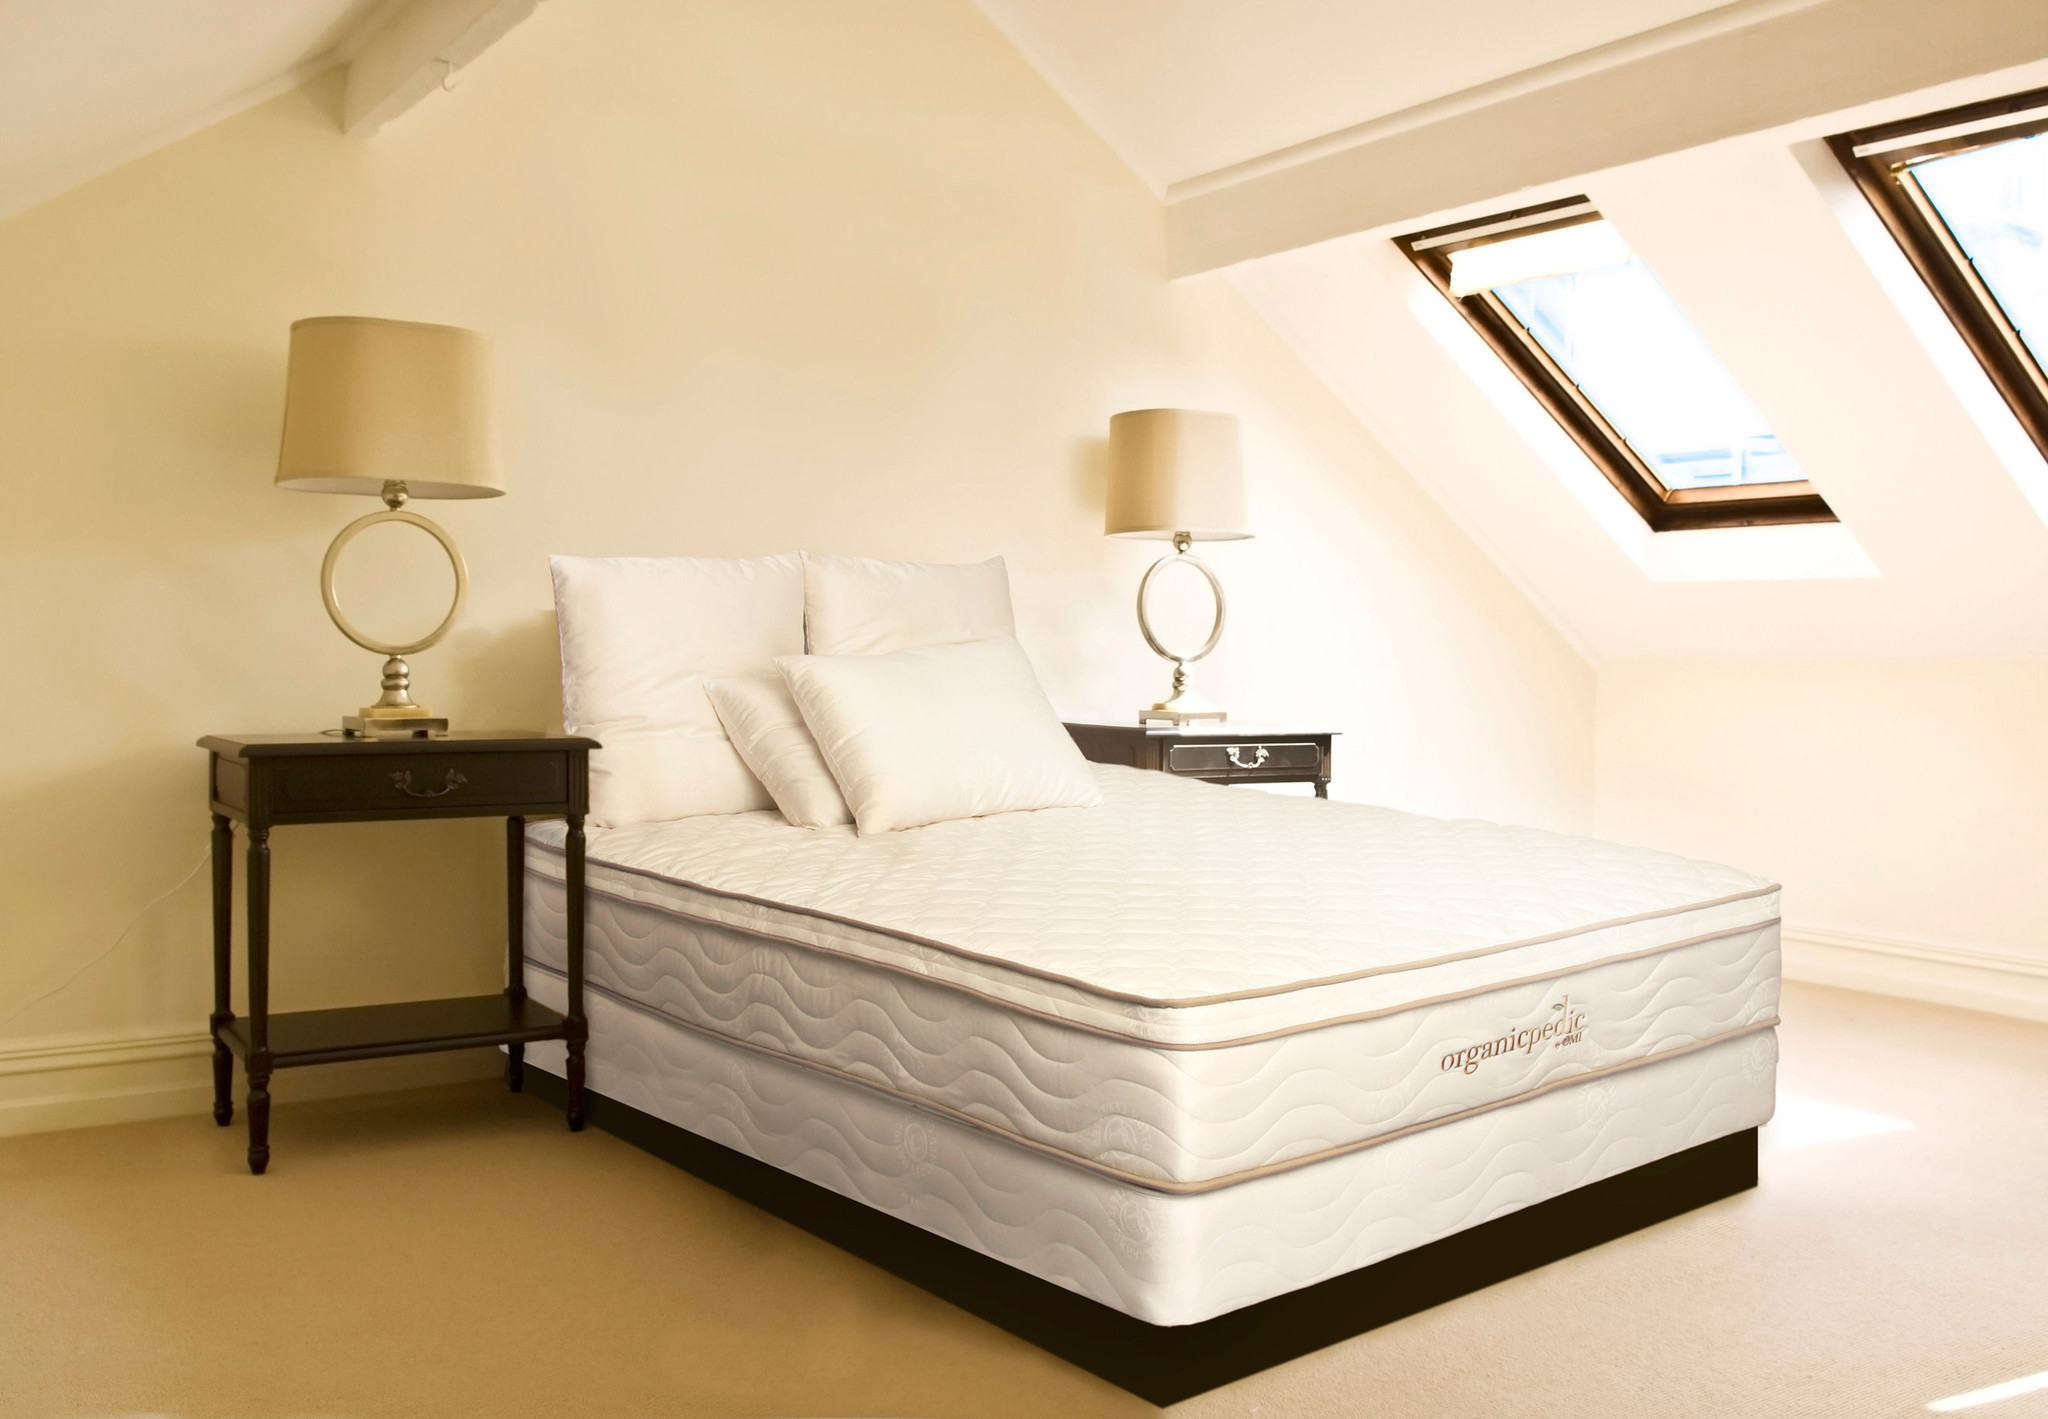 organicpedic duo mattress bedroom omi adb95db3 011e 4015 8e44 588d87056a6a.jpeg